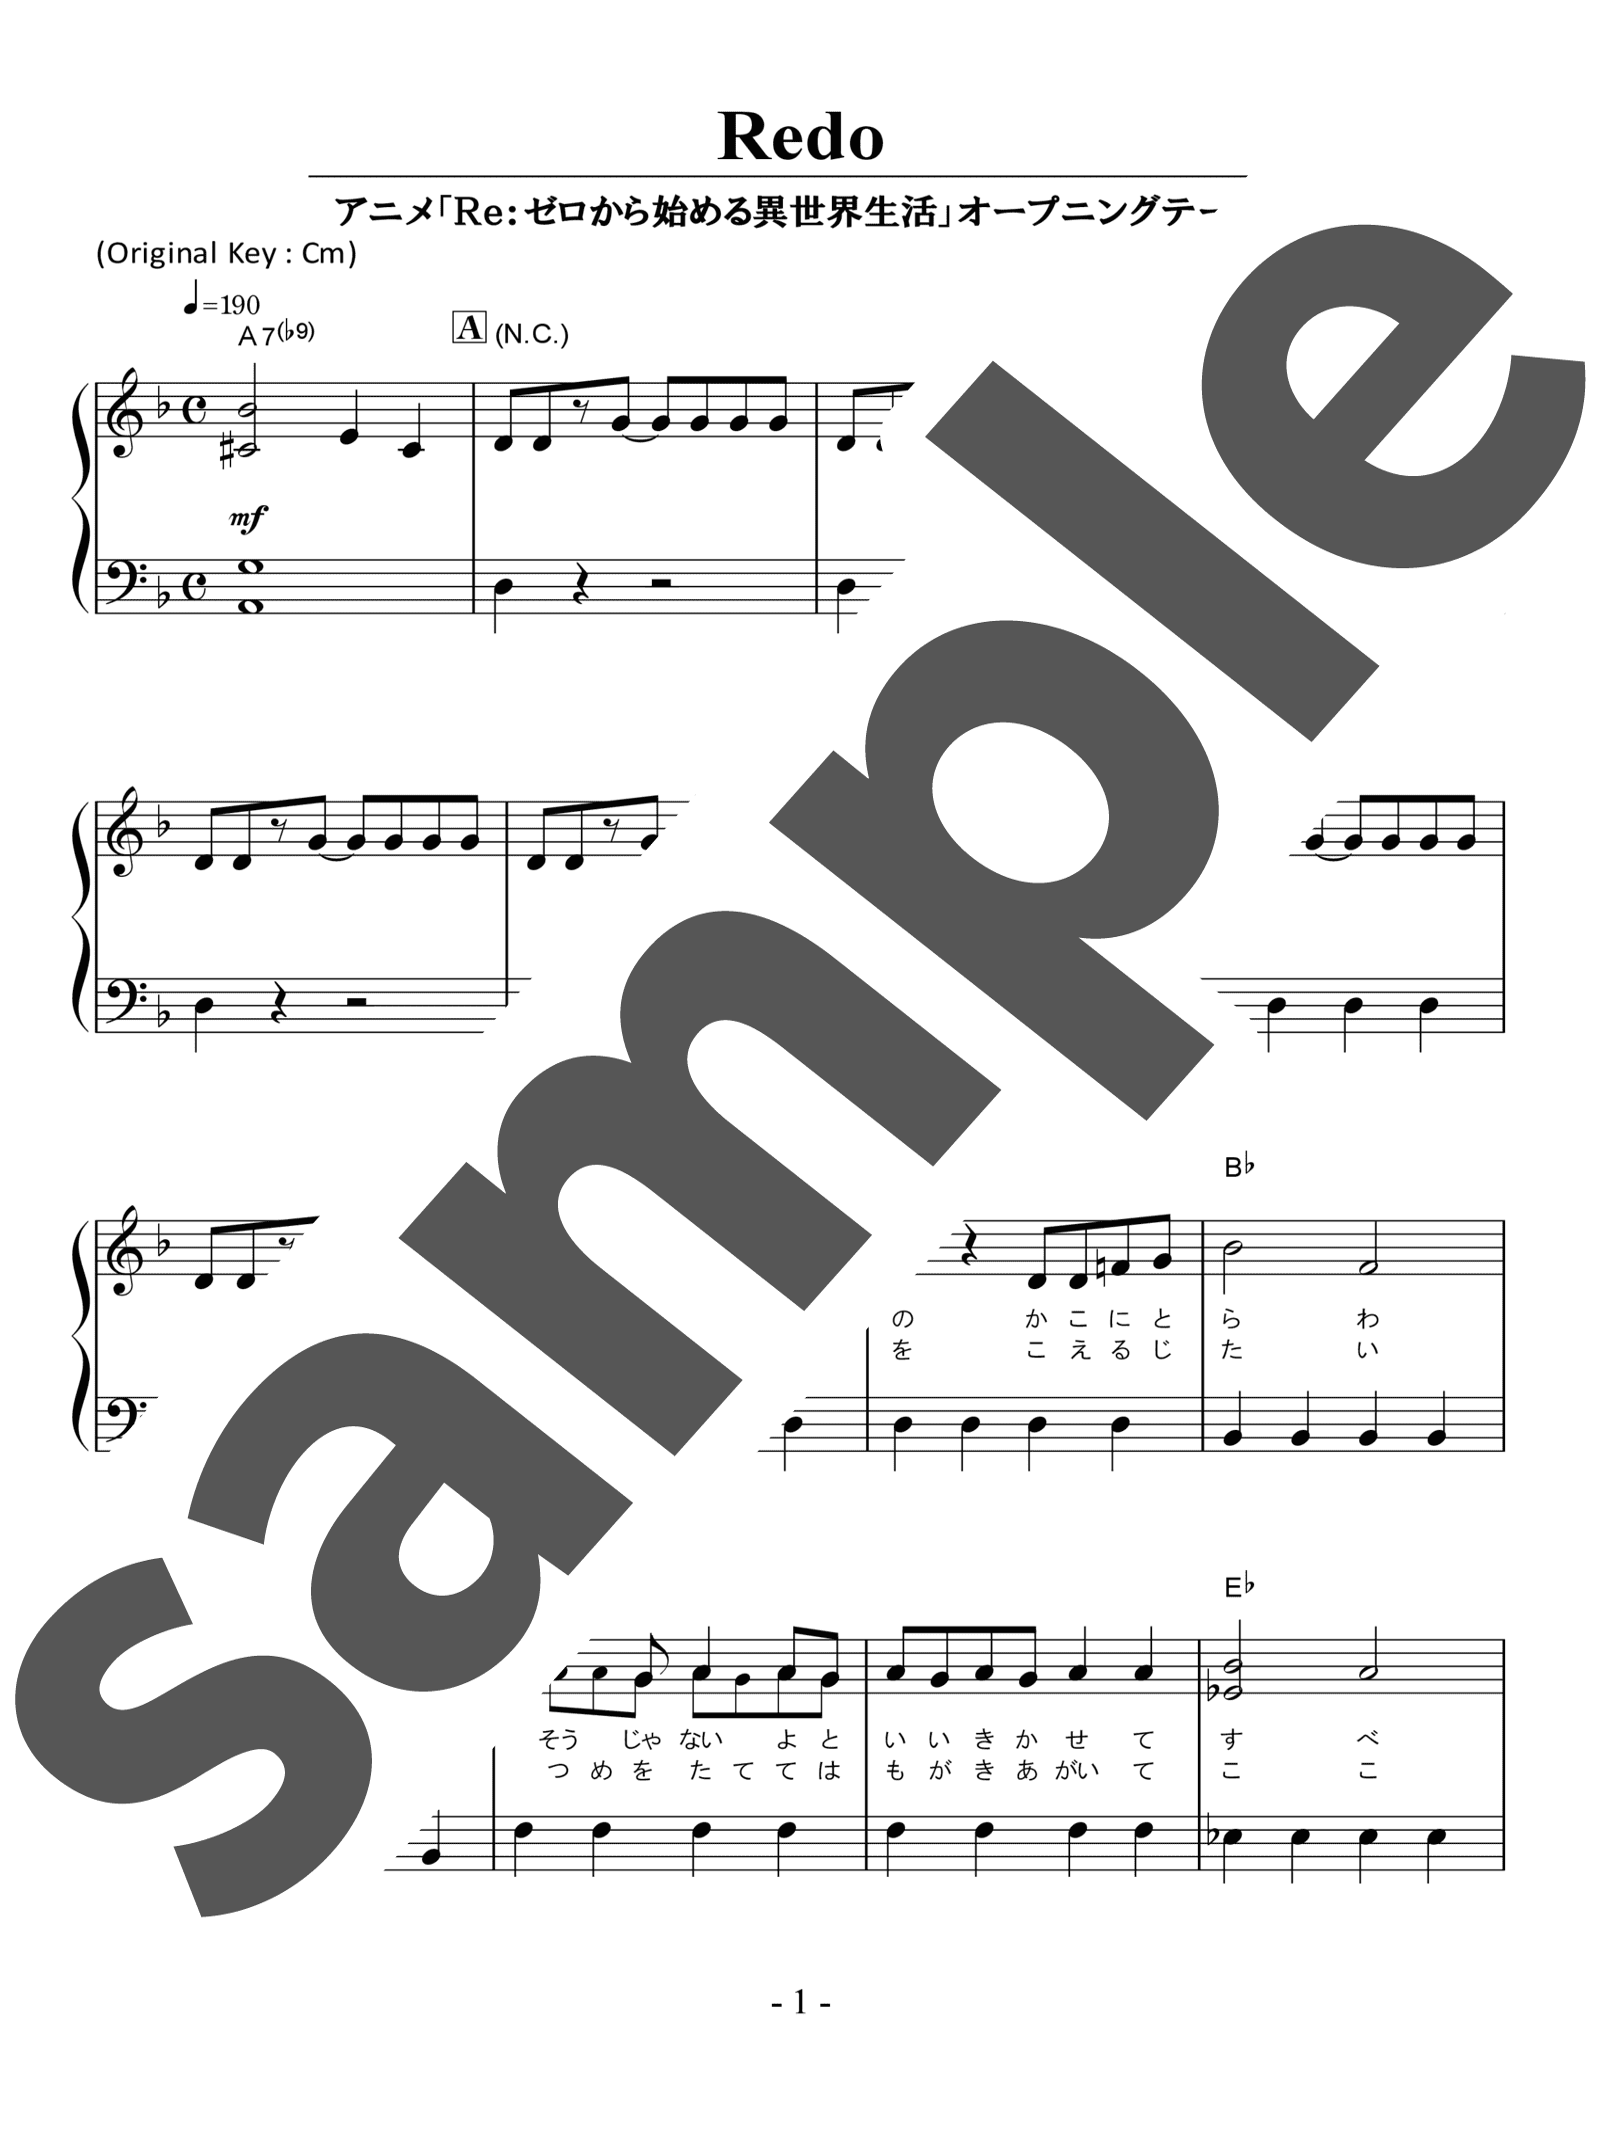 「Redo」のサンプル楽譜